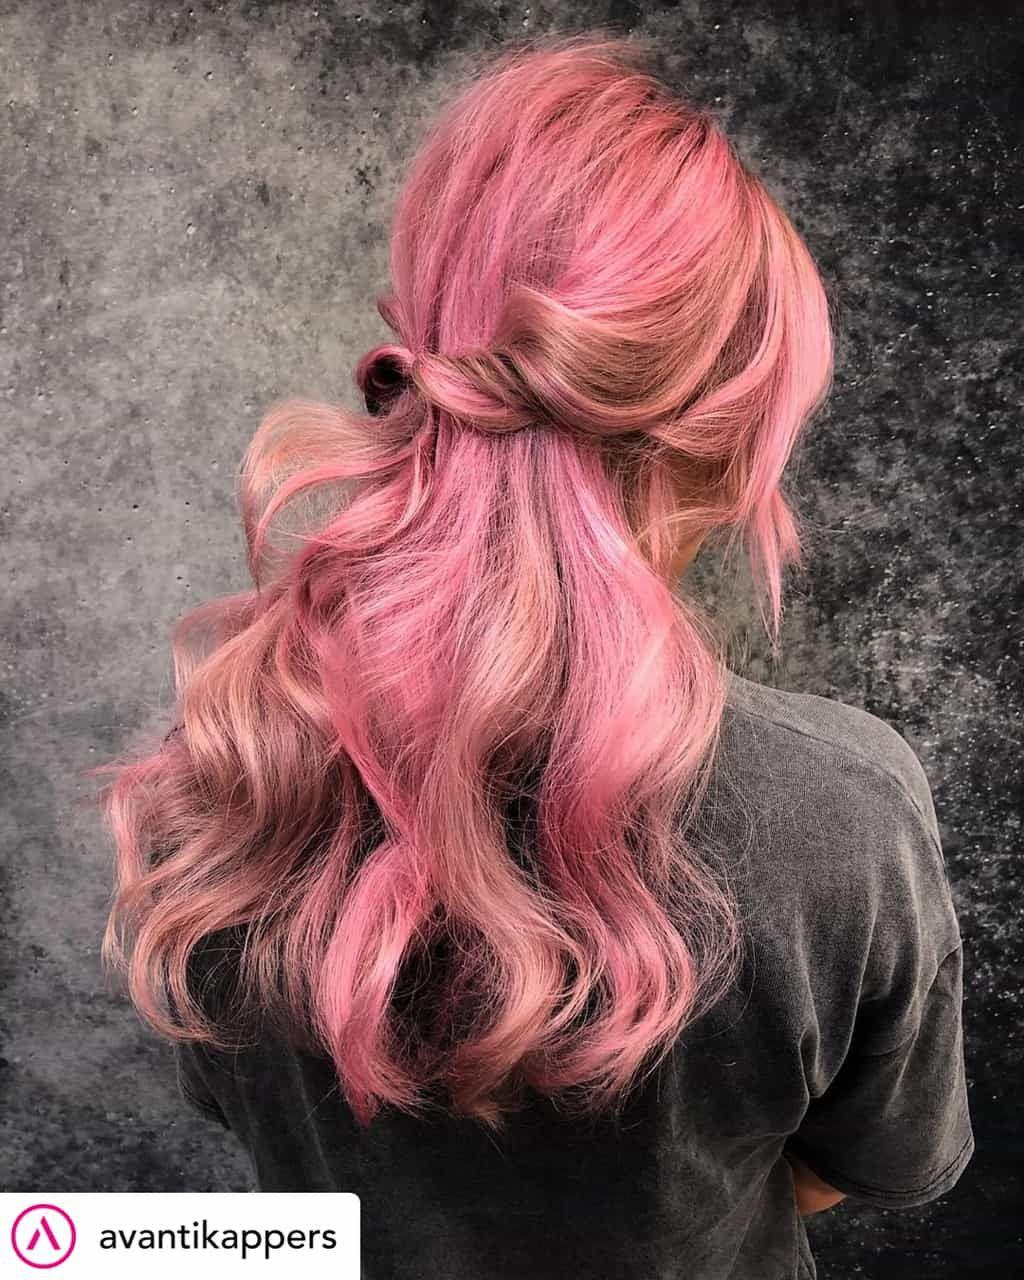 10 Brilliant Shades of Christmas Hair Color Hair color